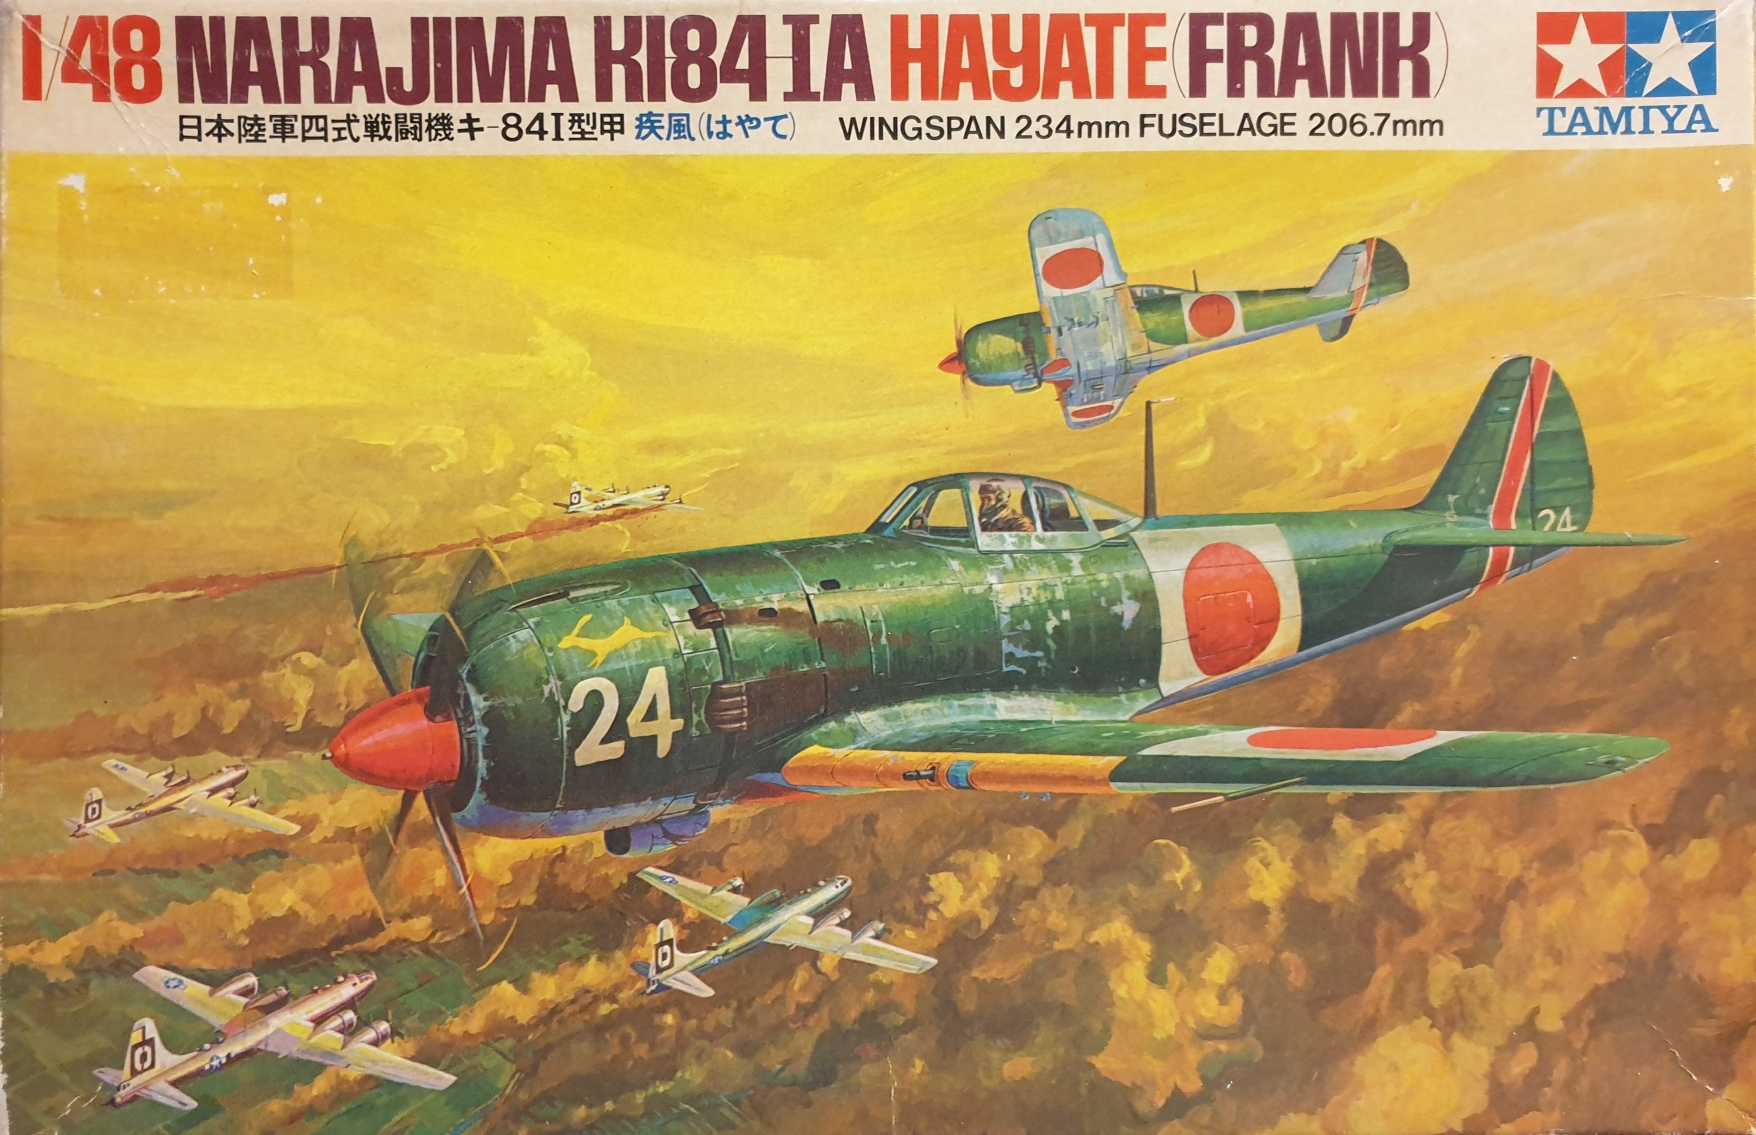 Tamiya MA113 Nakajima K184 IA Hayate (Frank)